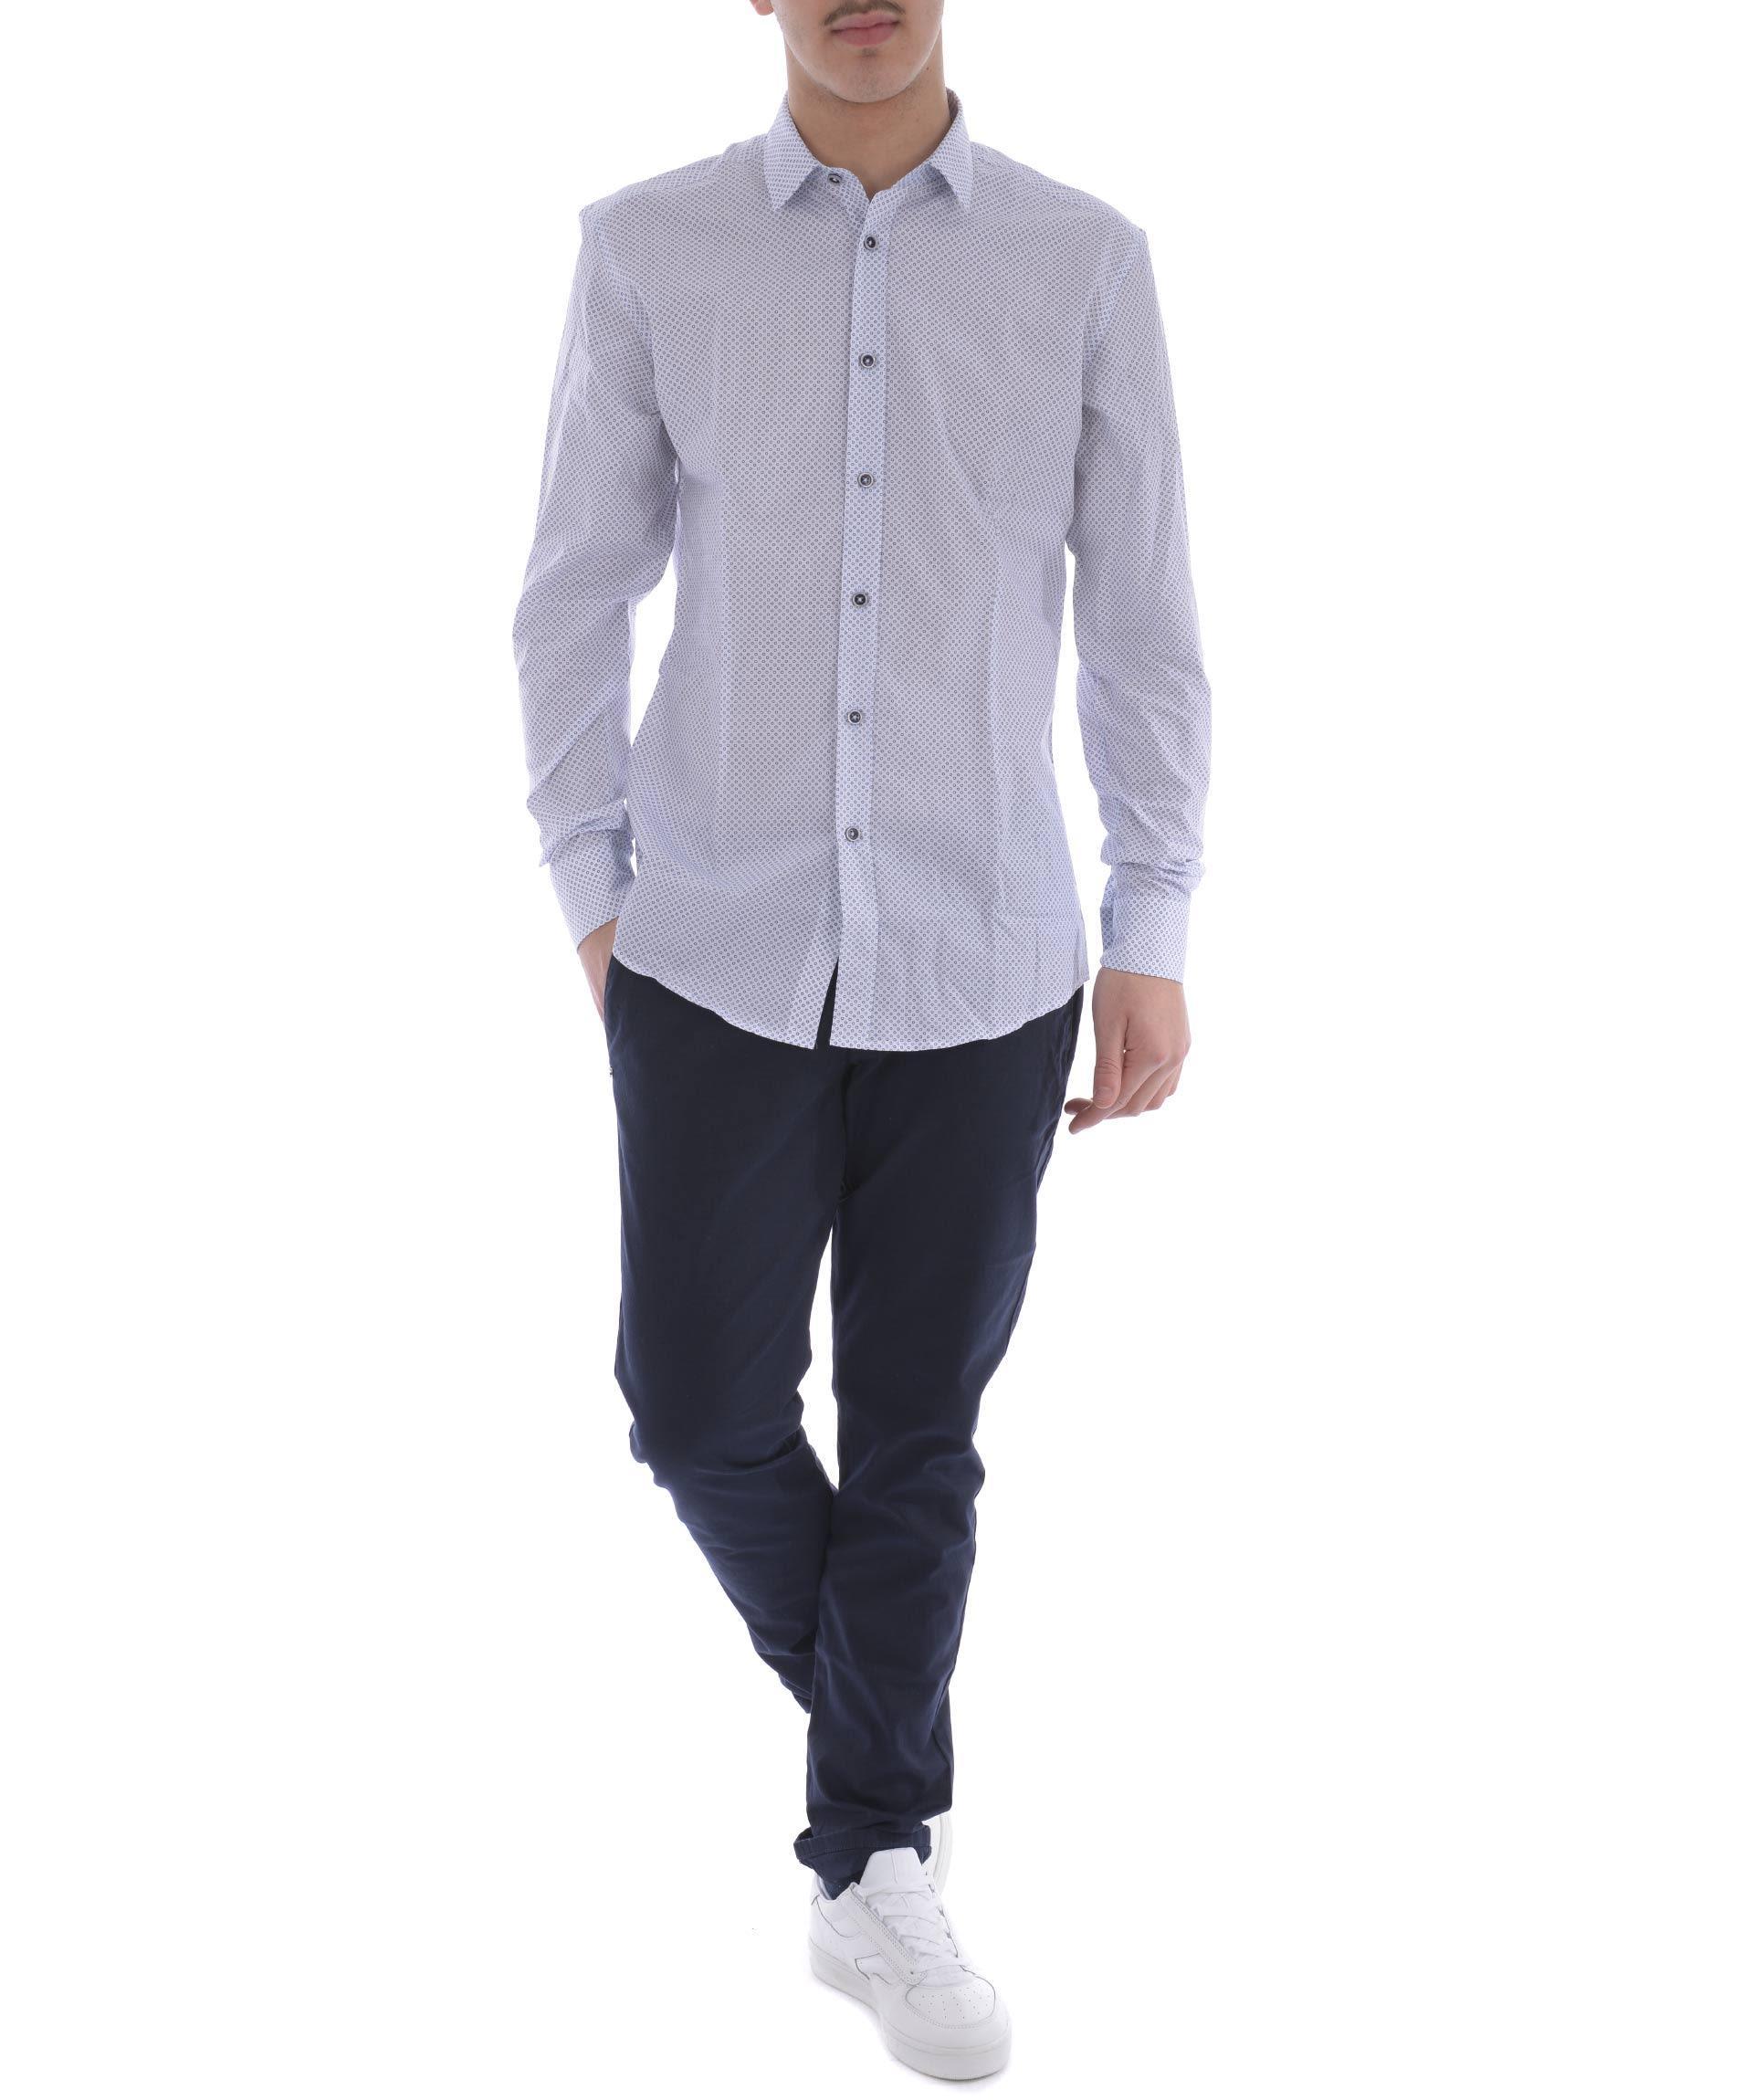 Daniele Alessandrini Printed Shirt In Bianco-blu